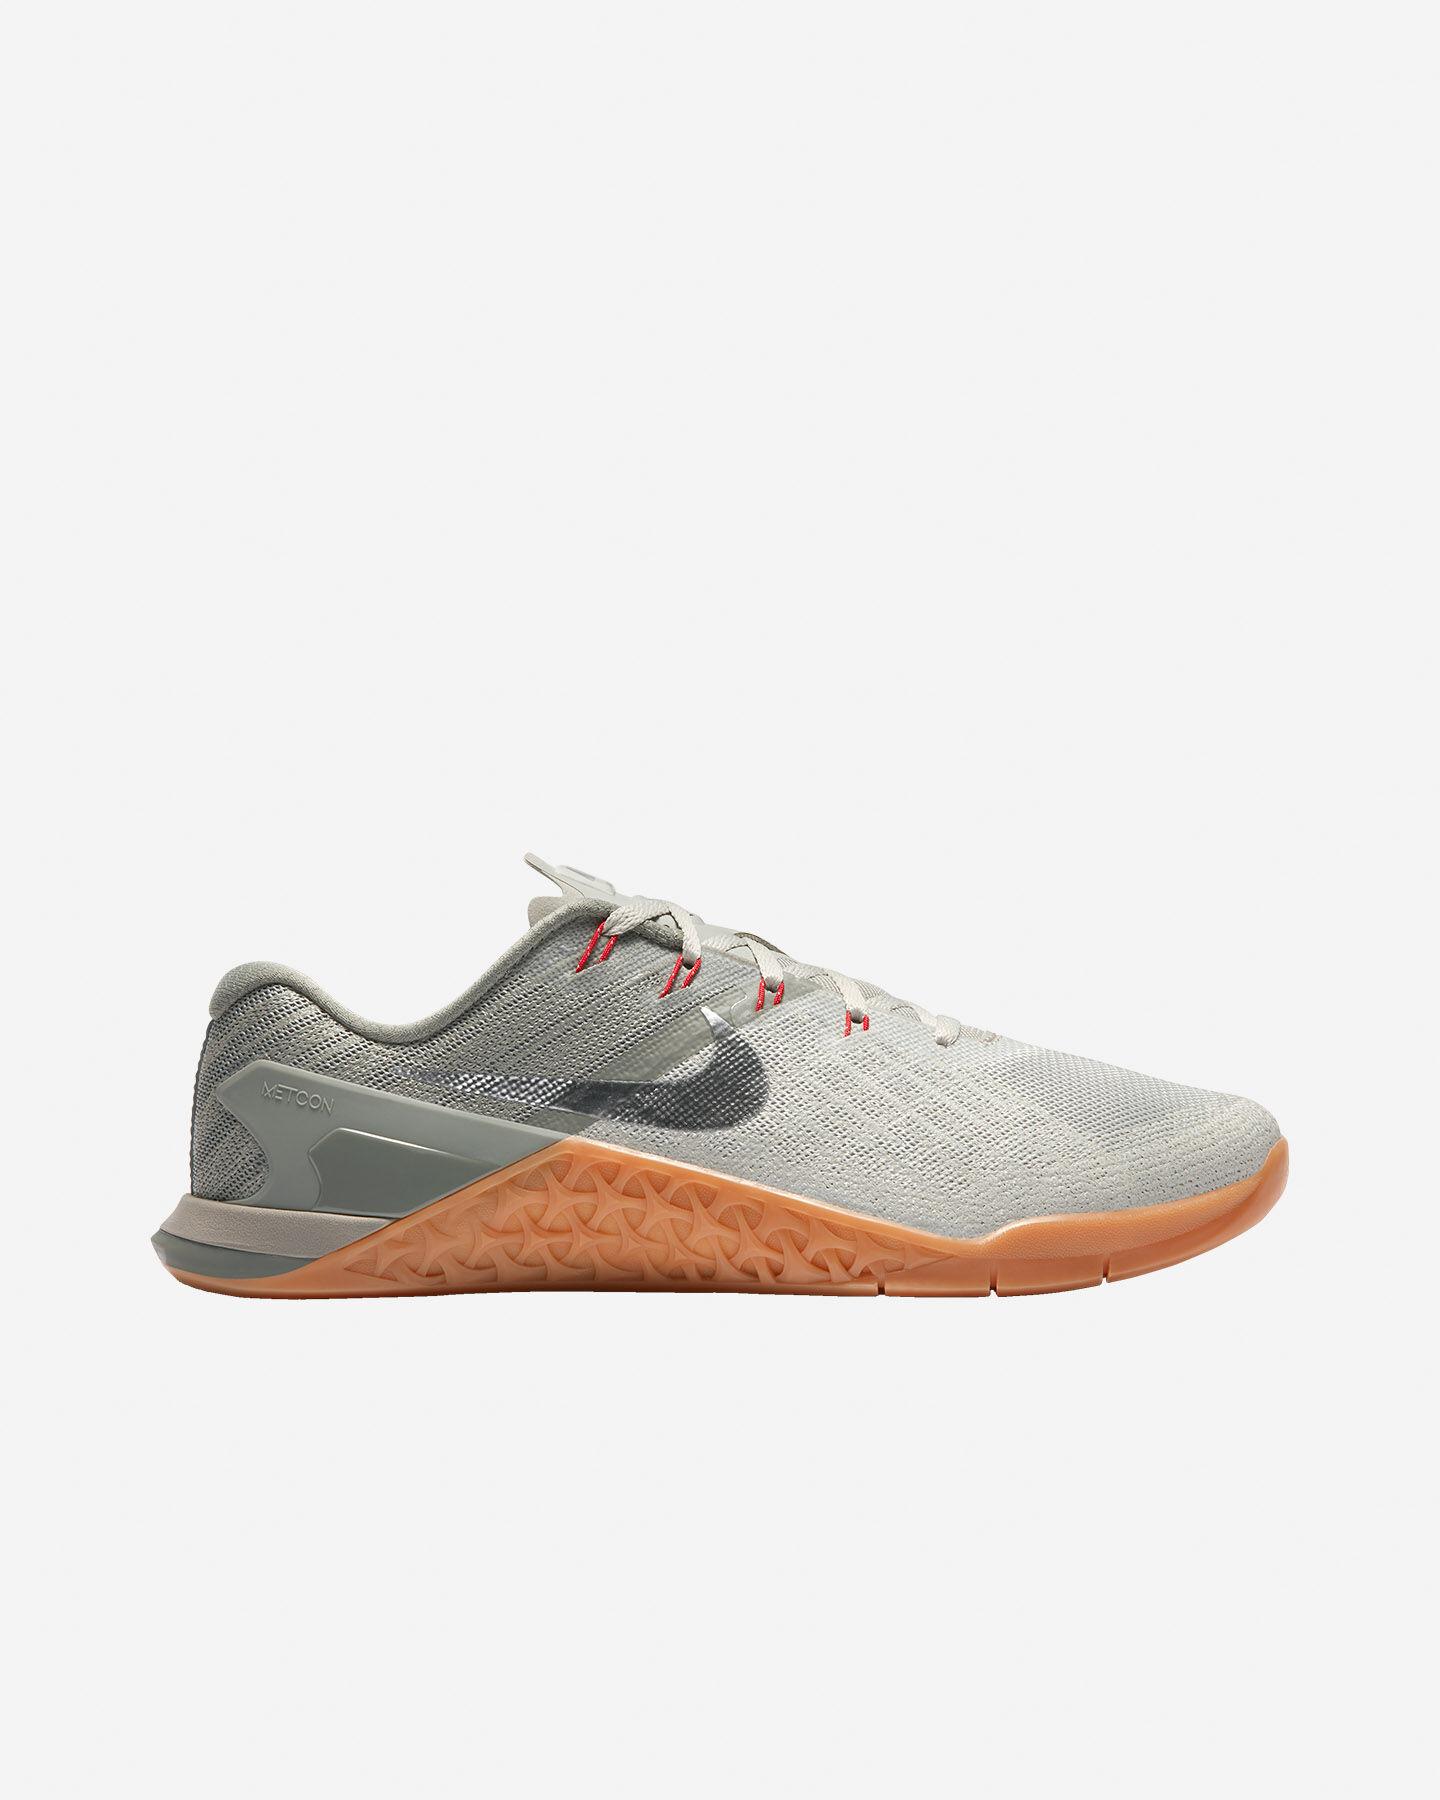 Su Metcon M Scarpe Nike Sportive Sport Ph0q0wun5t Cisalfa 3 852928 uPiTkXOZ